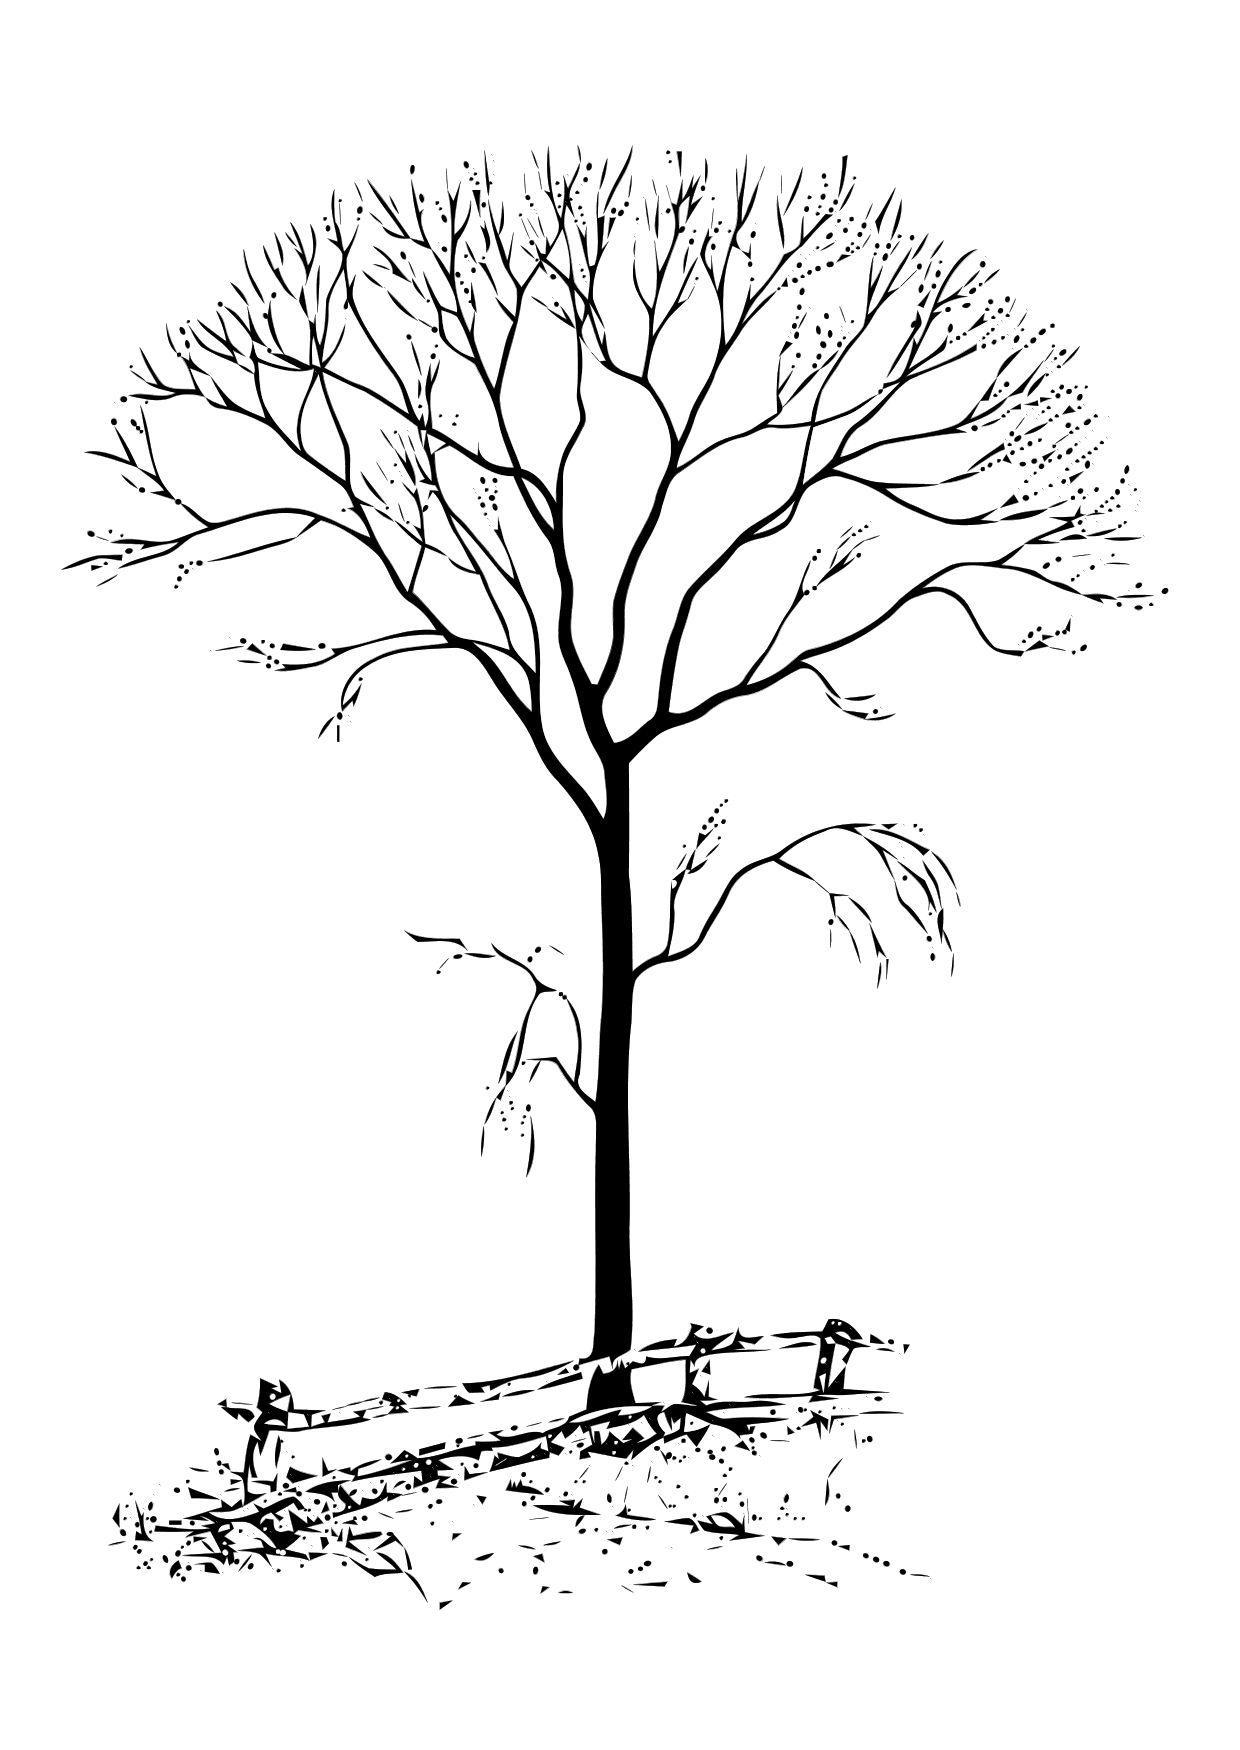 malvorlage kahler baum | ausmalbild 11411.